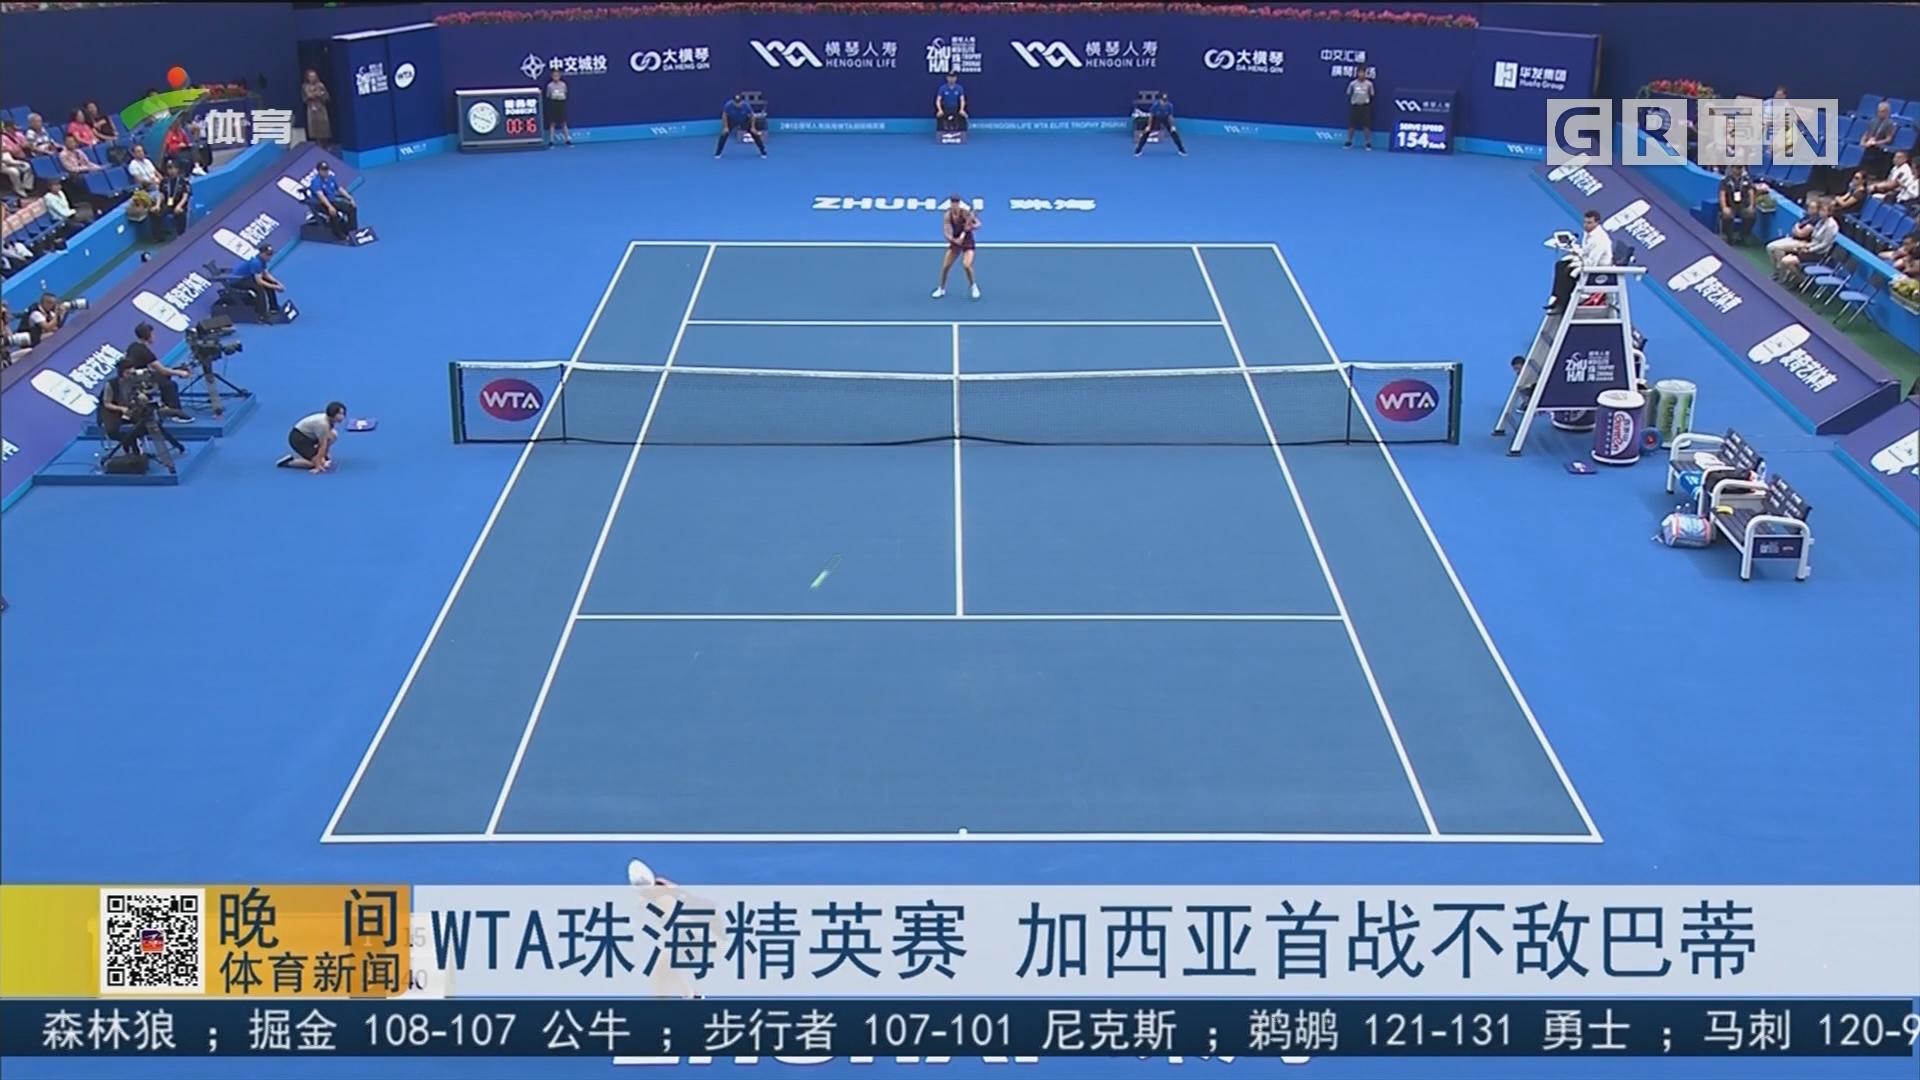 WTA珠海精英赛 加西亚首战不敌巴蒂